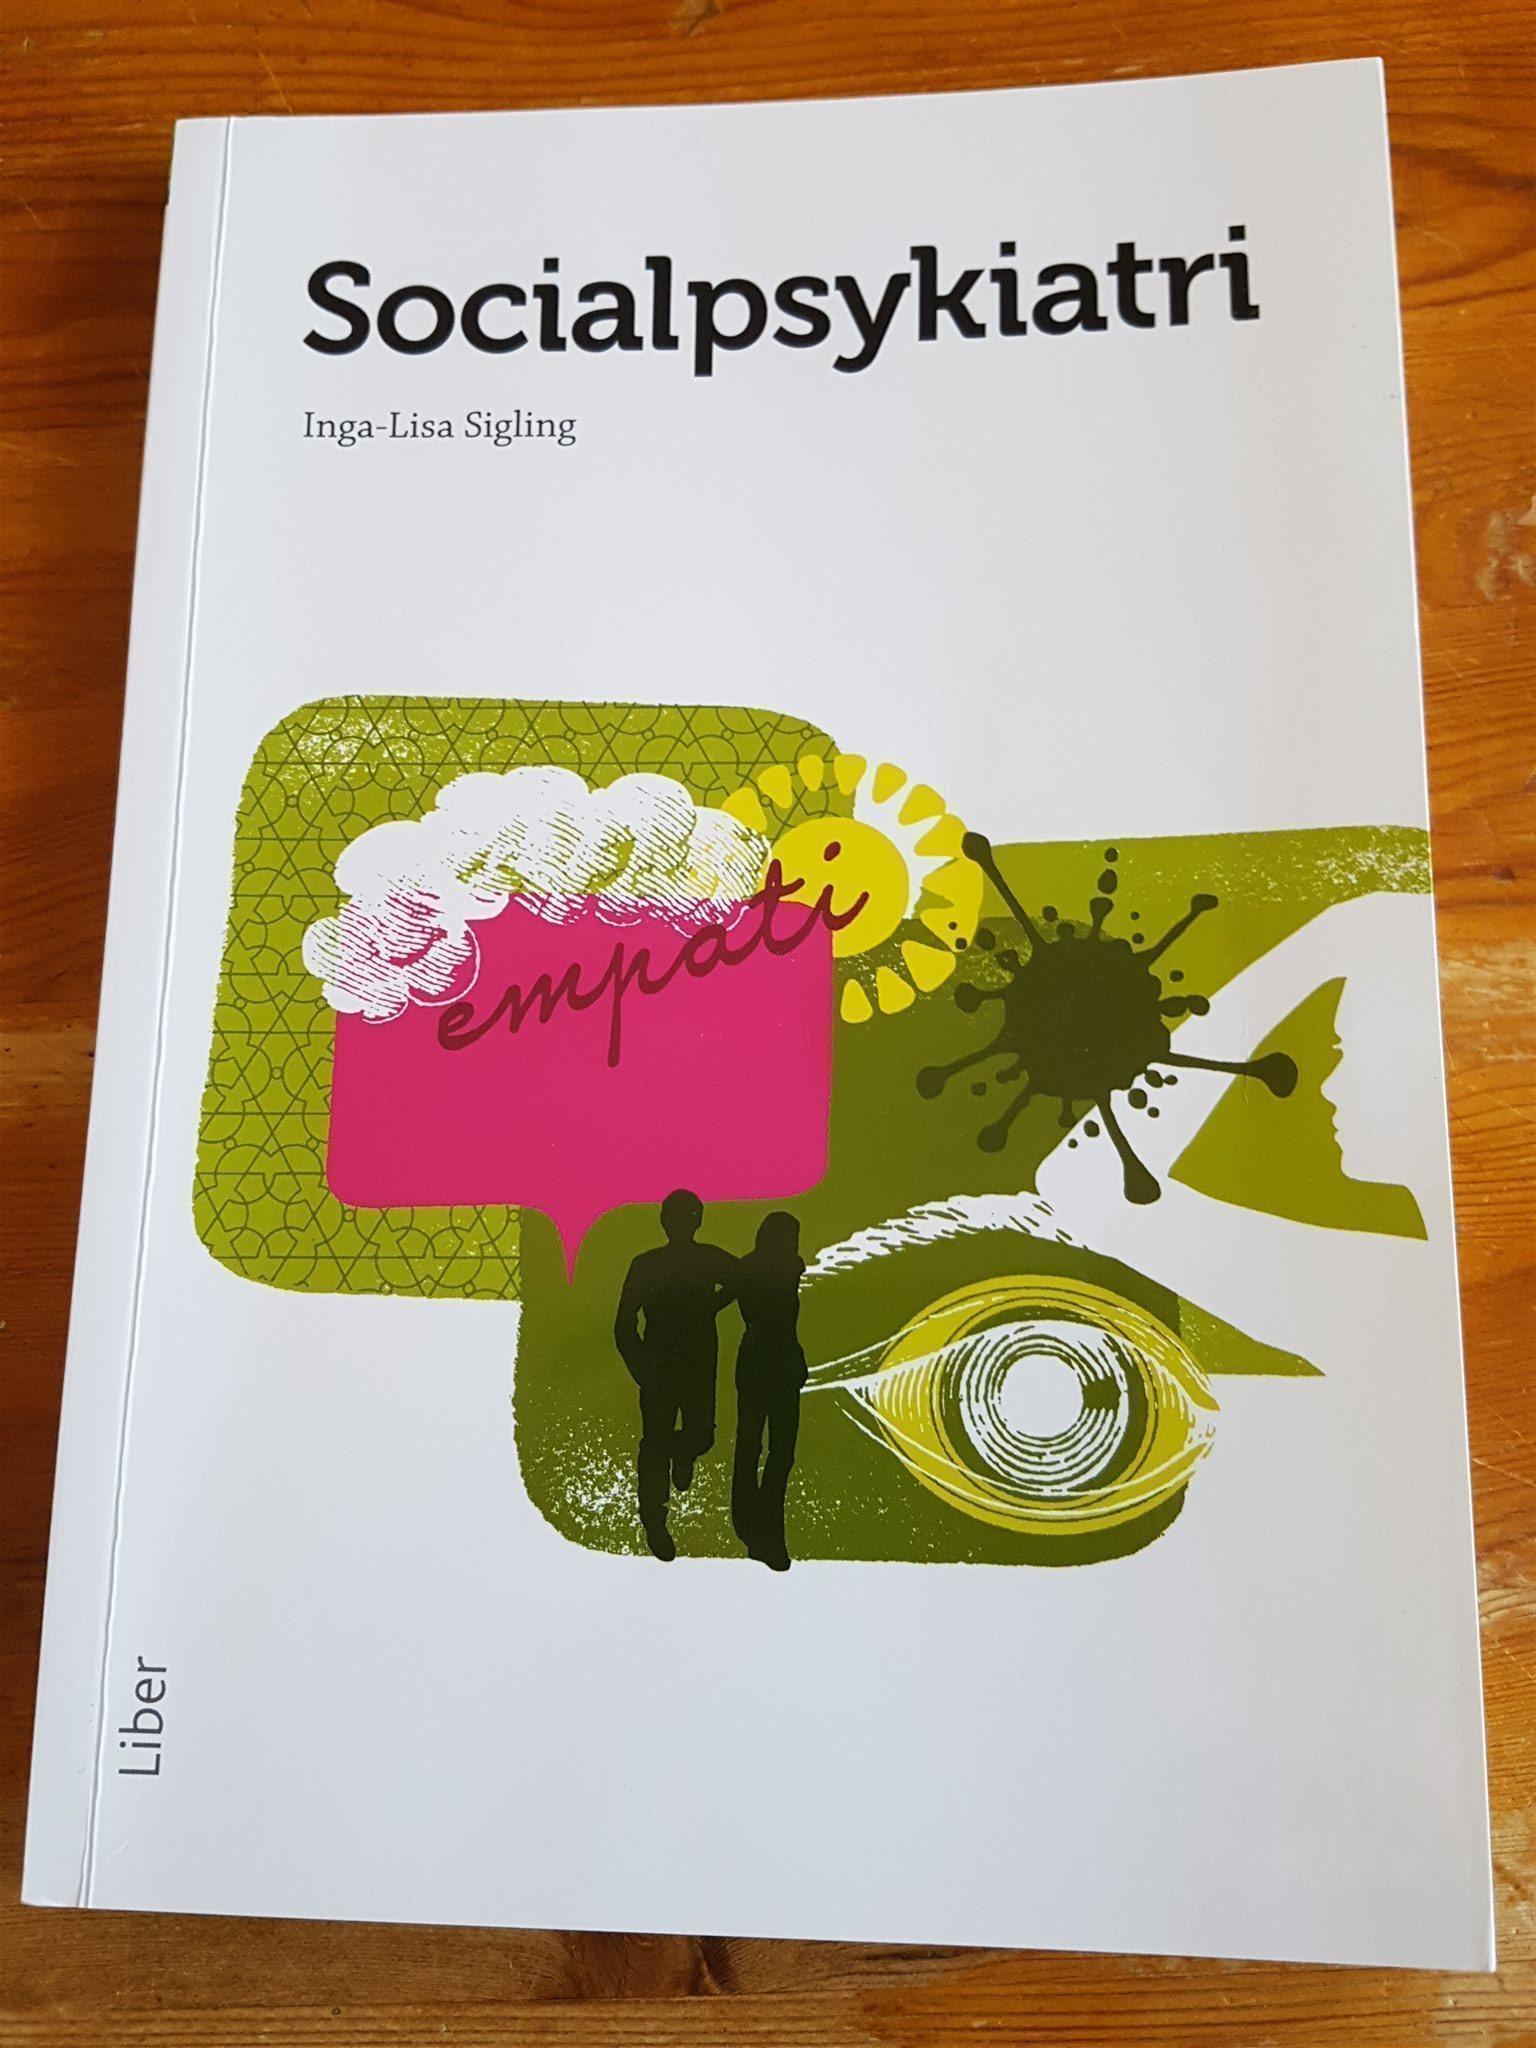 Socialpsykiatri Inga-Lisa Sigling Som ny!